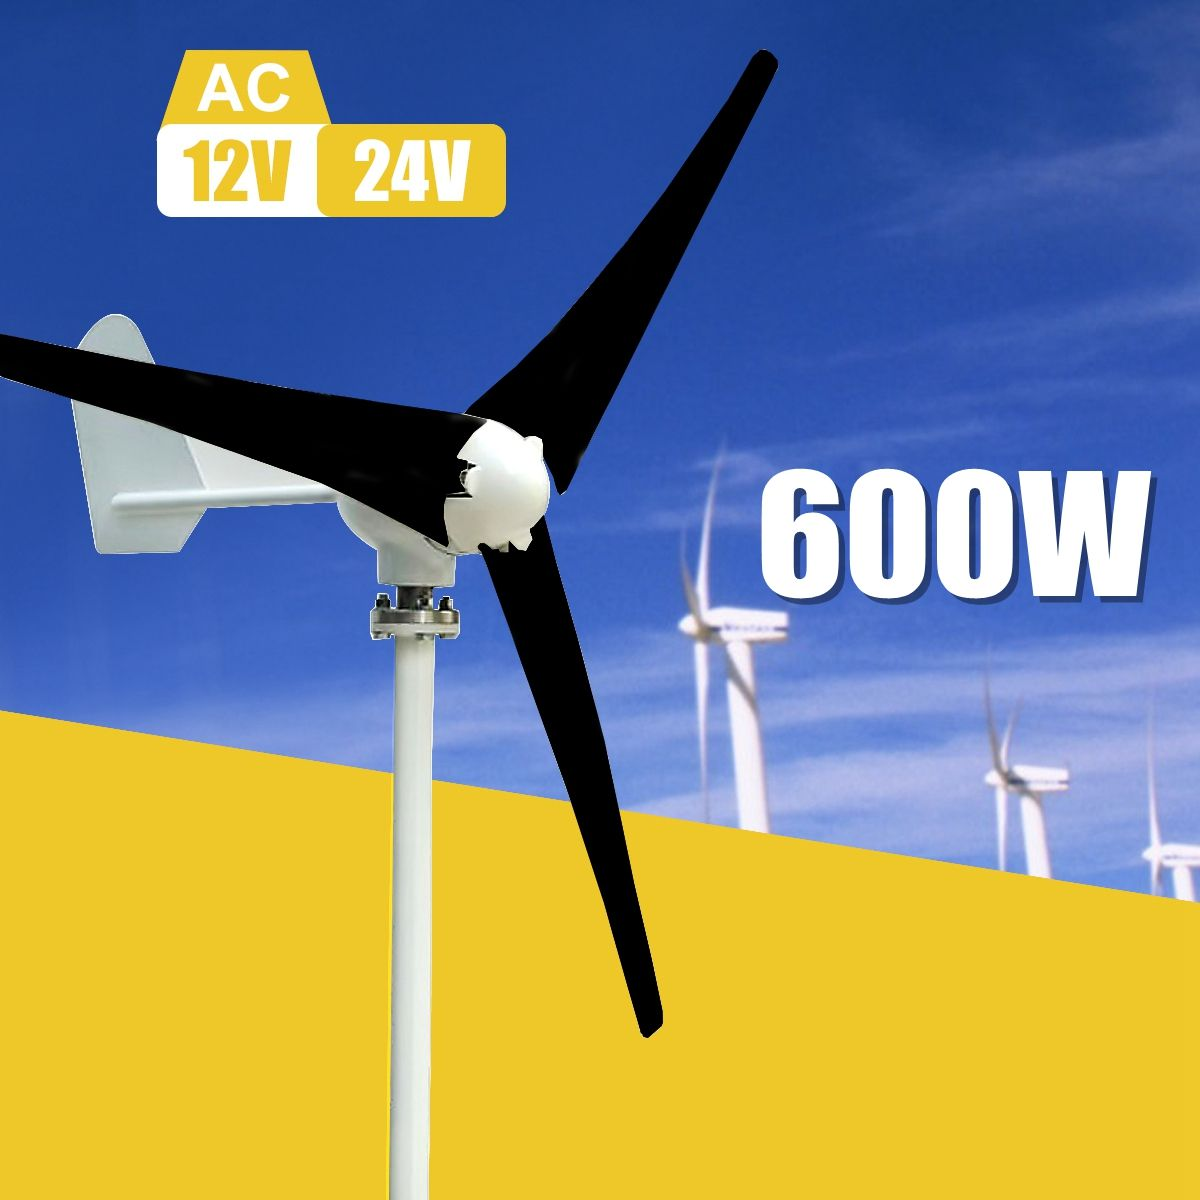 Max 600 watt Wind Turbine Generator Kit Max AC 12 v 24 v 3 Klinge Option Aero